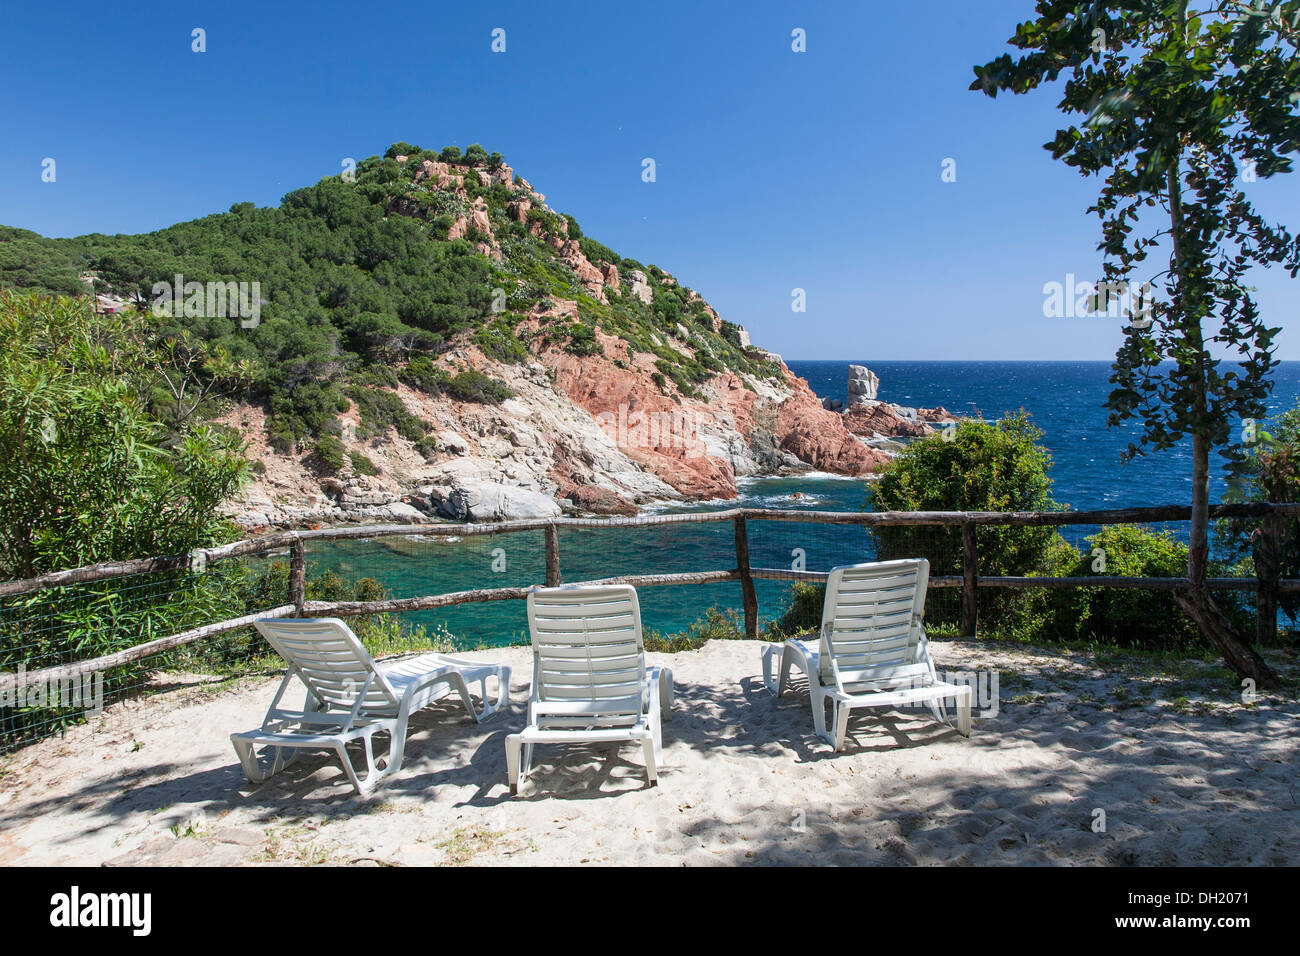 Outlook on the Sardinia coast - Stock Image